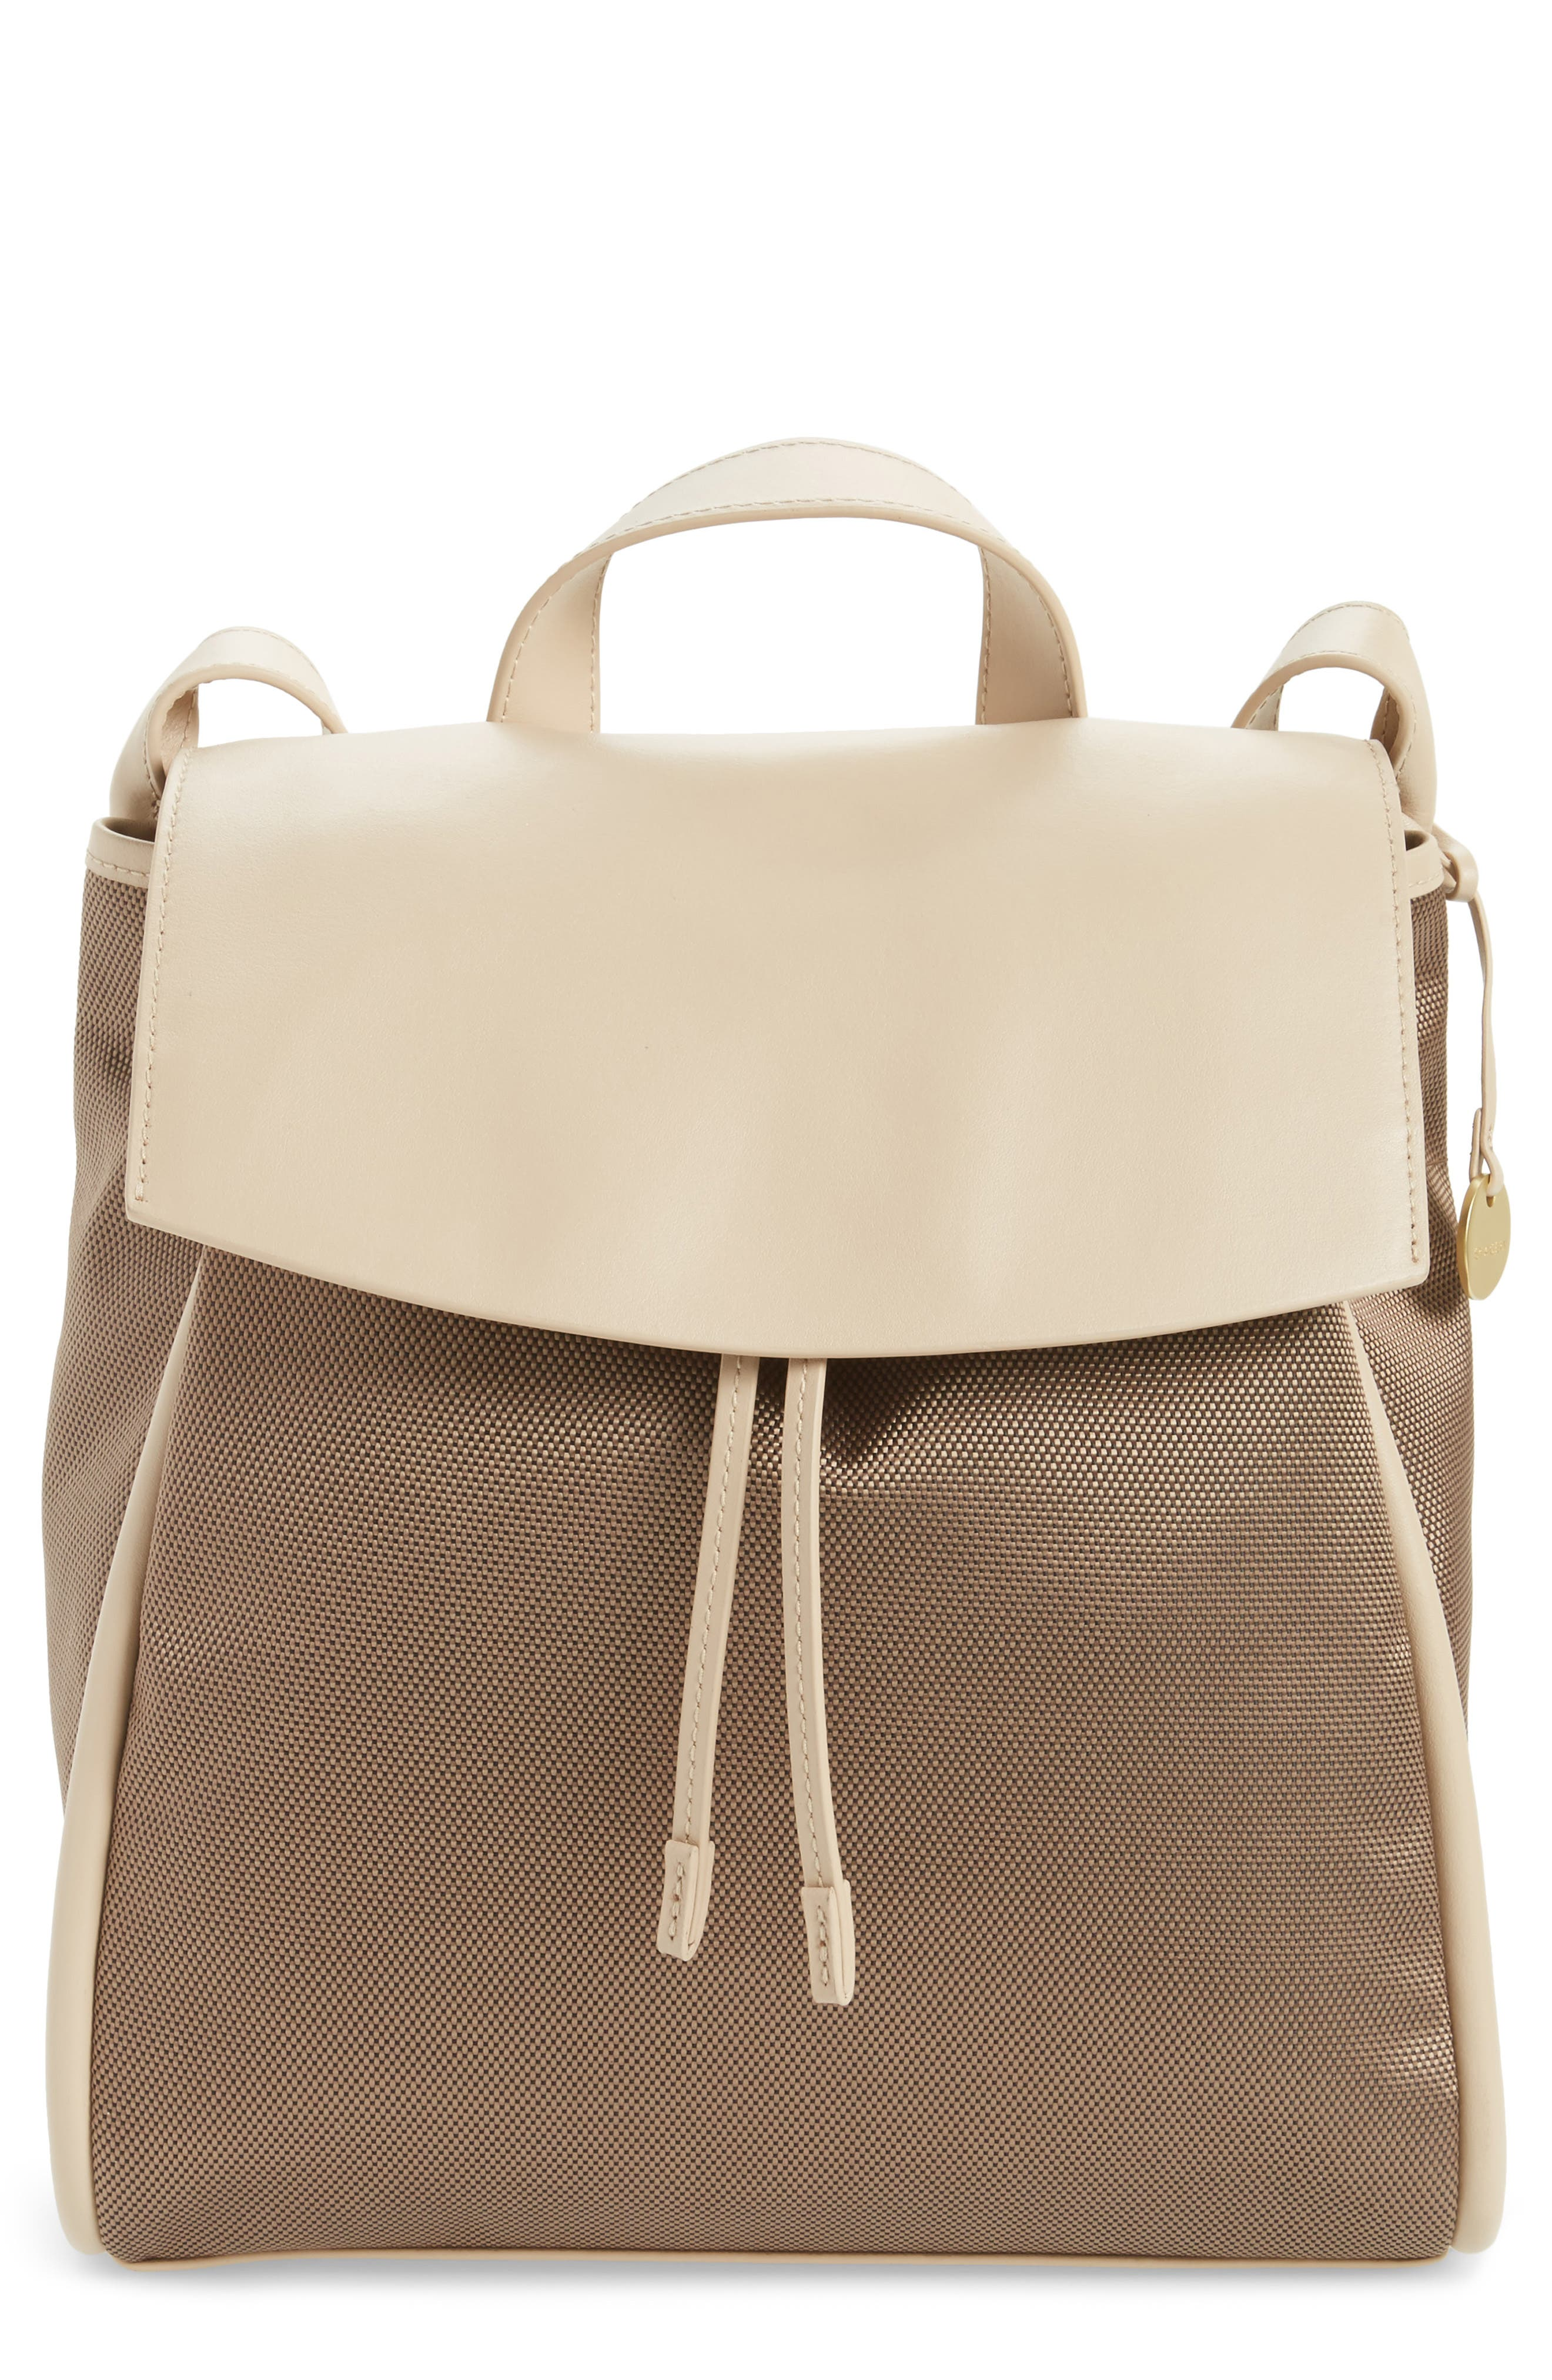 Ebba Leather & Canvas Backpack,                             Main thumbnail 1, color,                             Dark Khaki